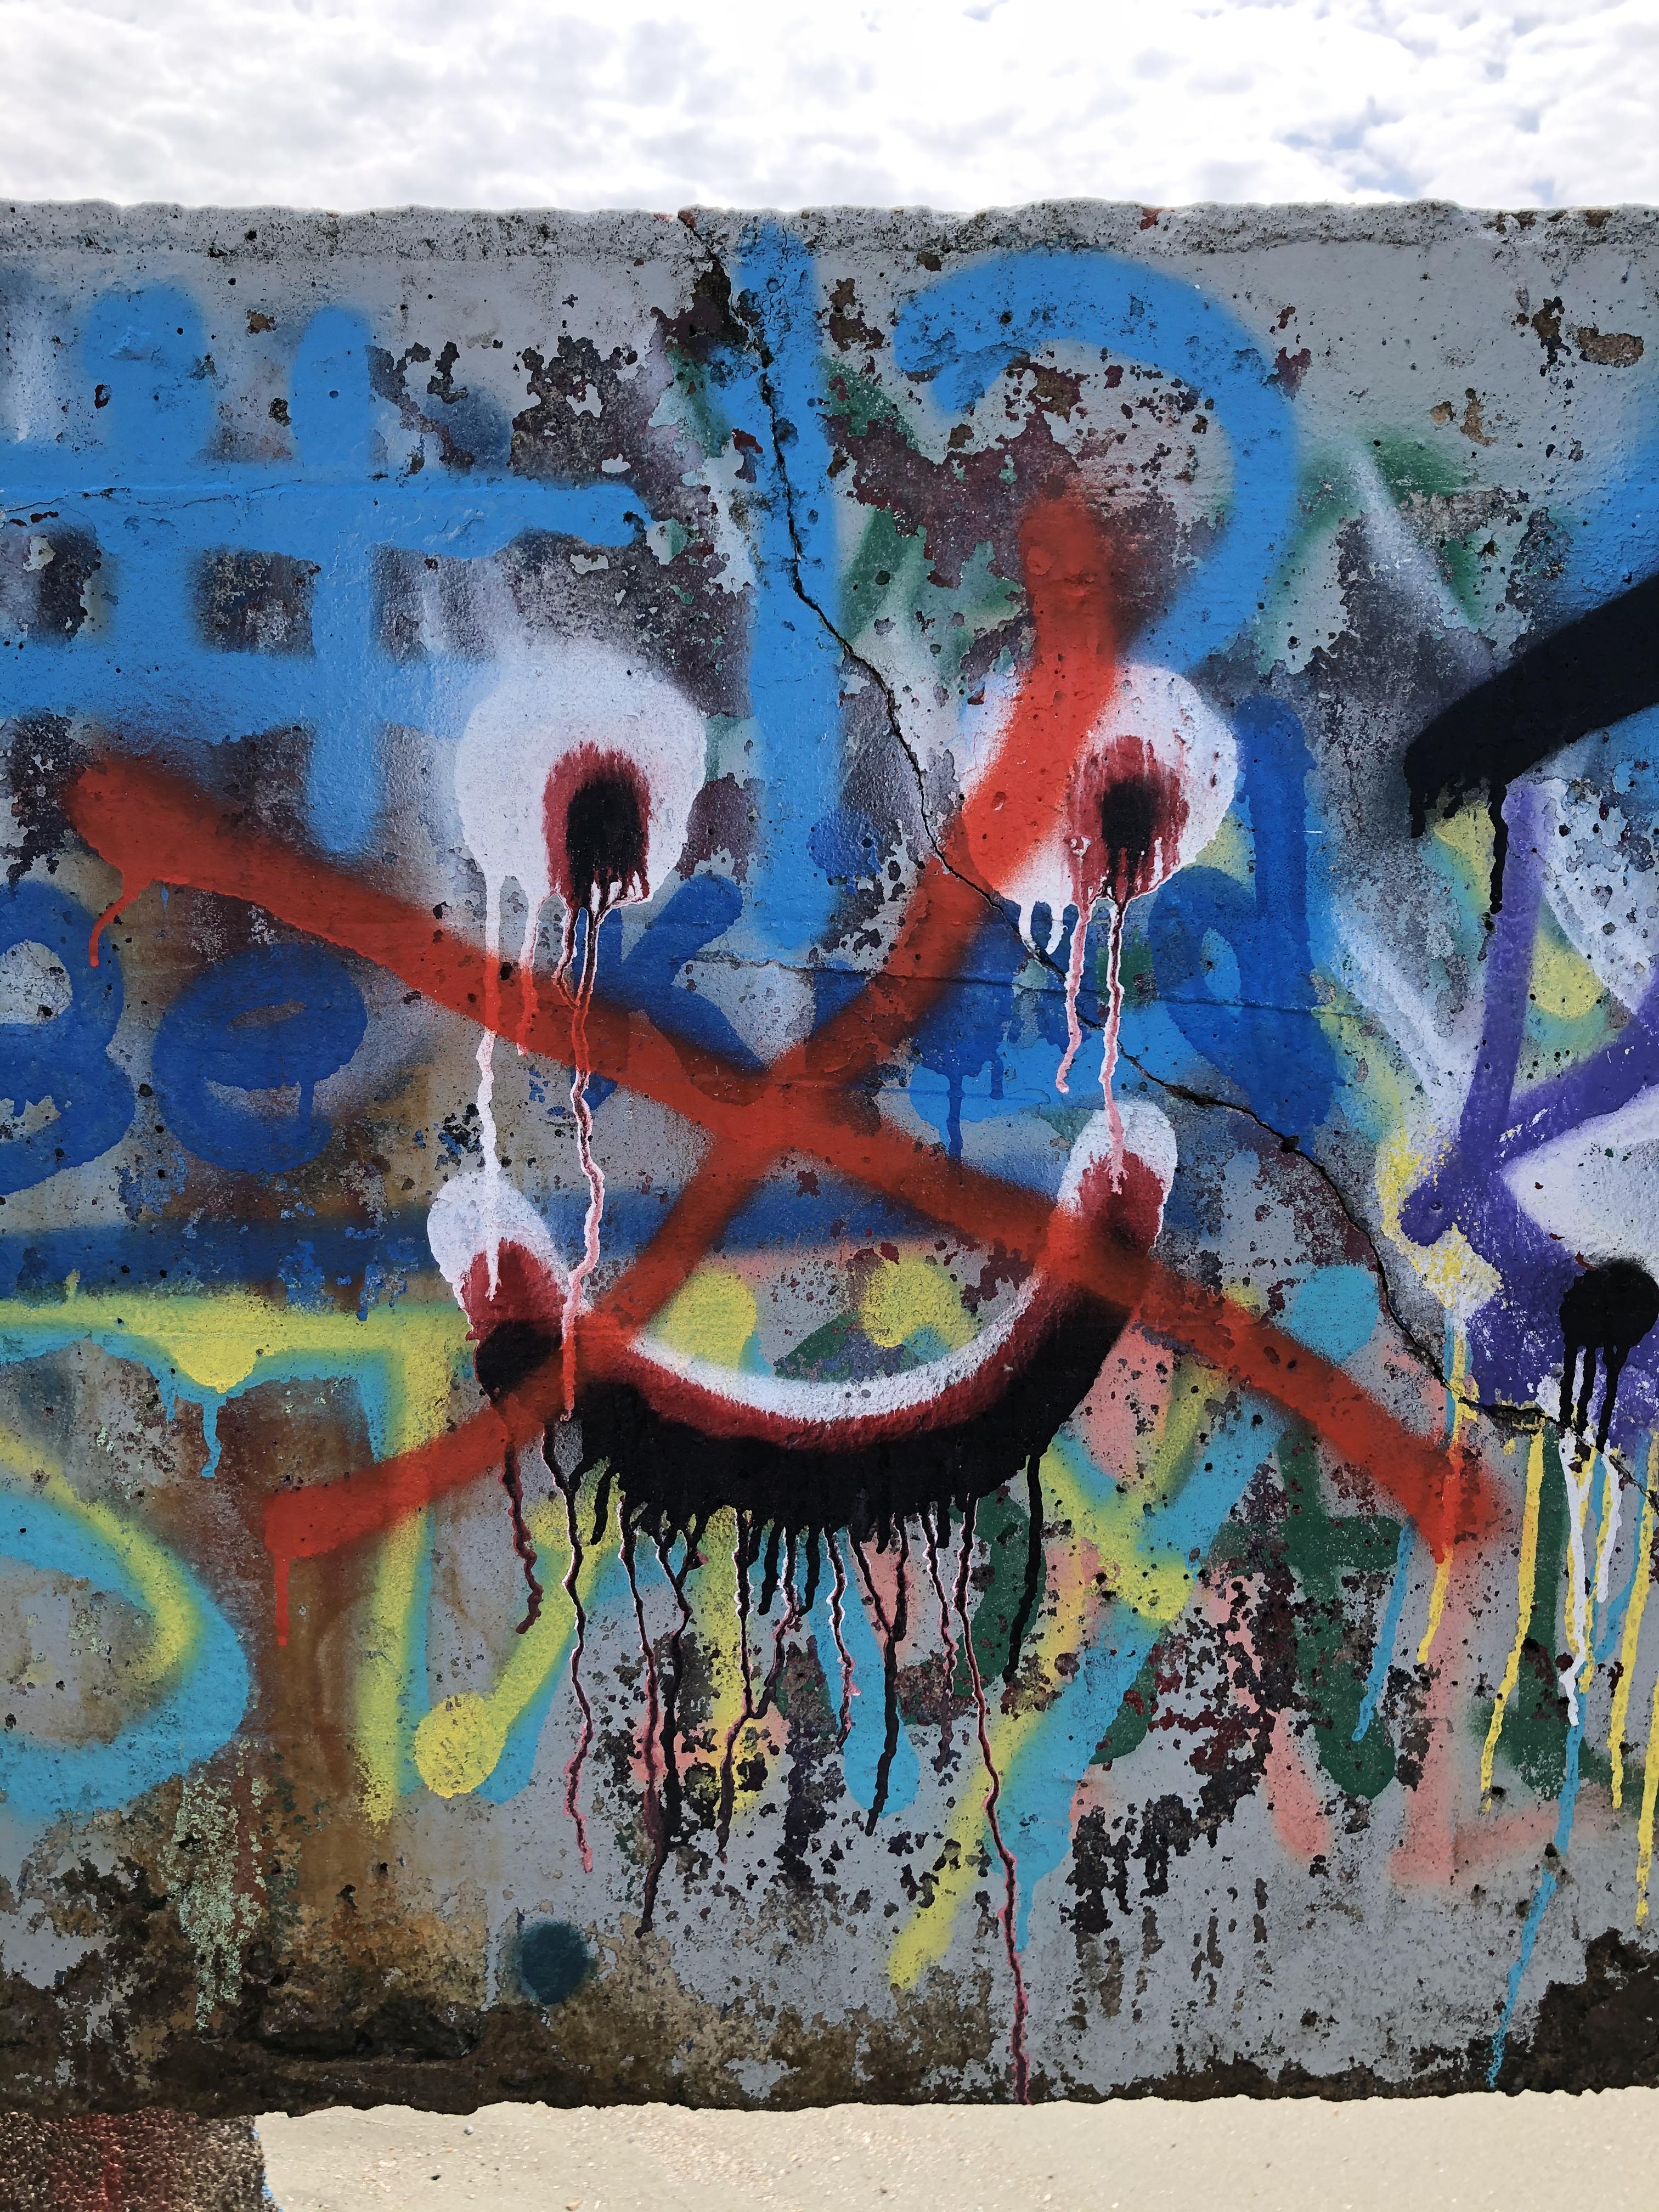 Graffiti Folly Beach South Carolina